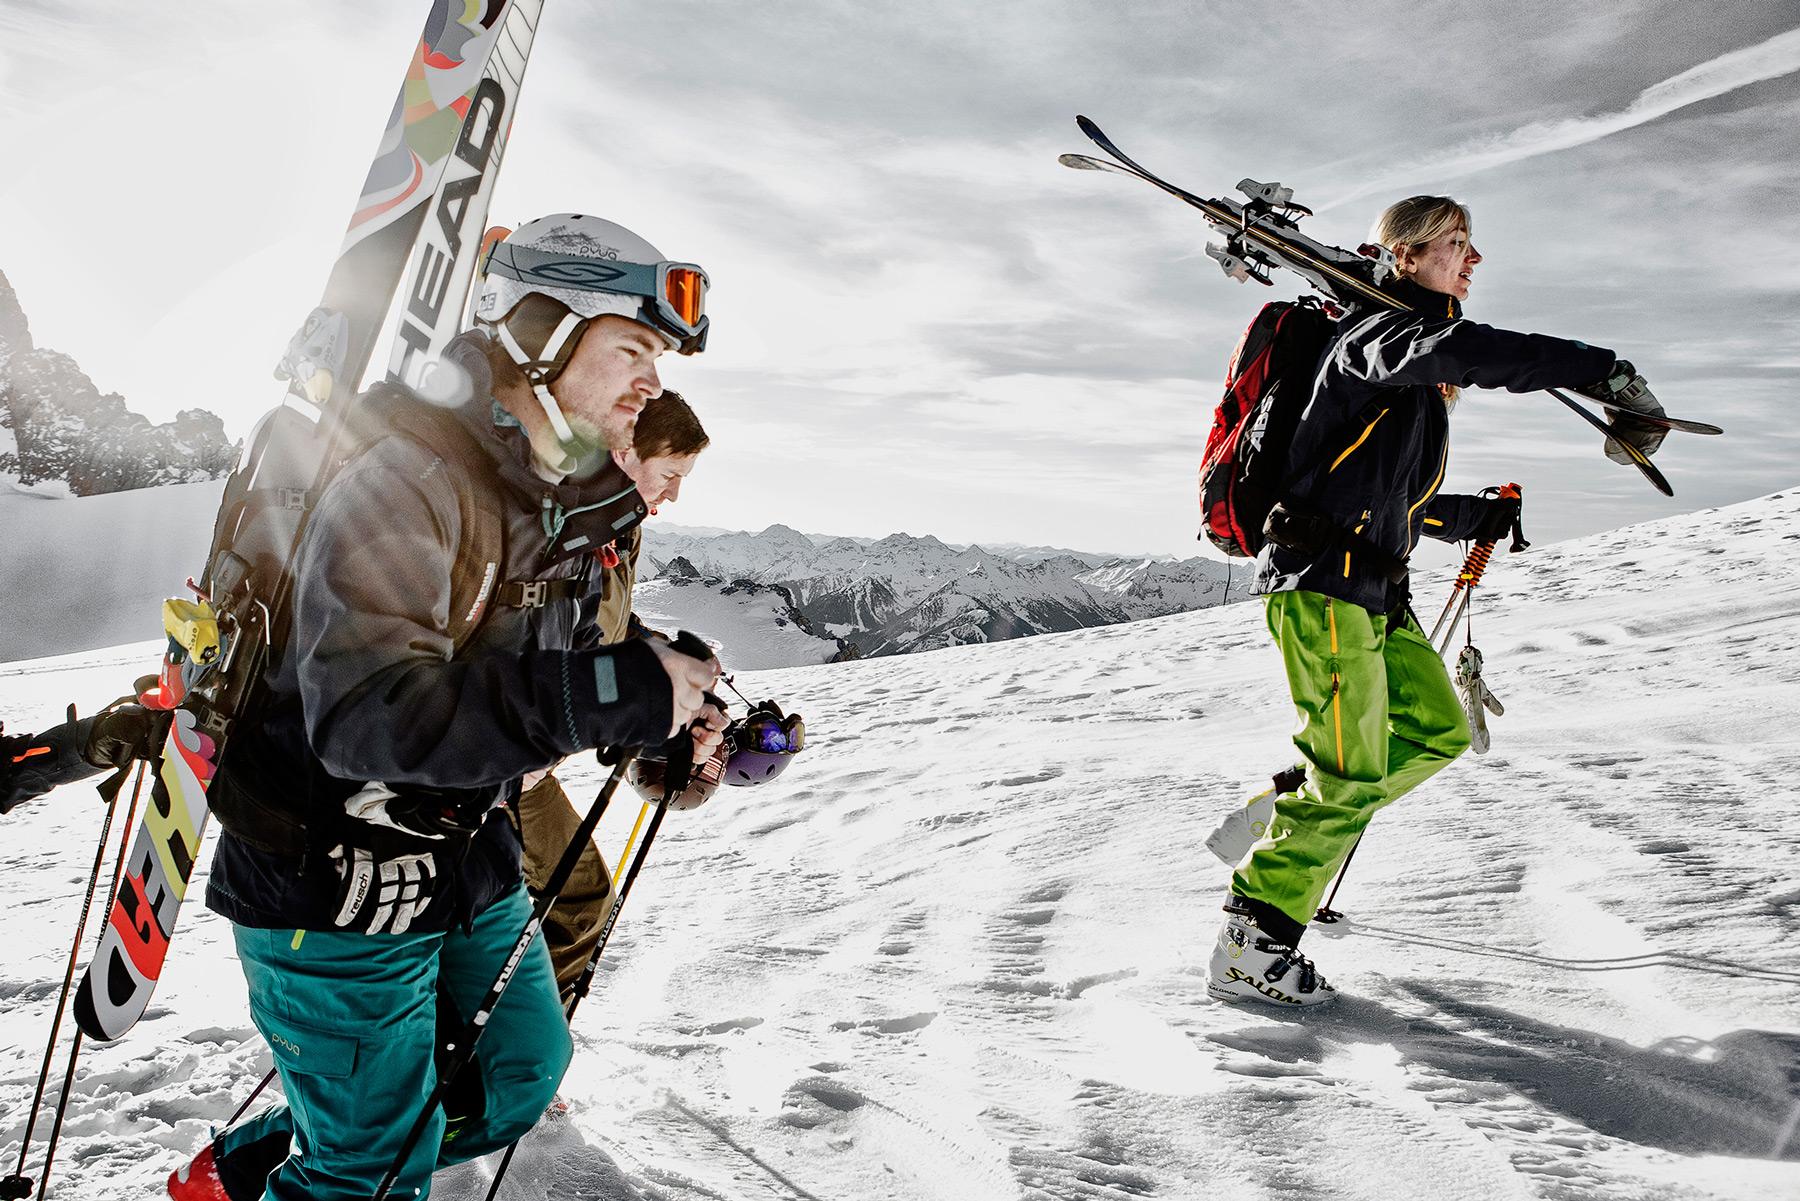 01-Pyua-Dachstein-Ski-Action-Christoph-Gramann